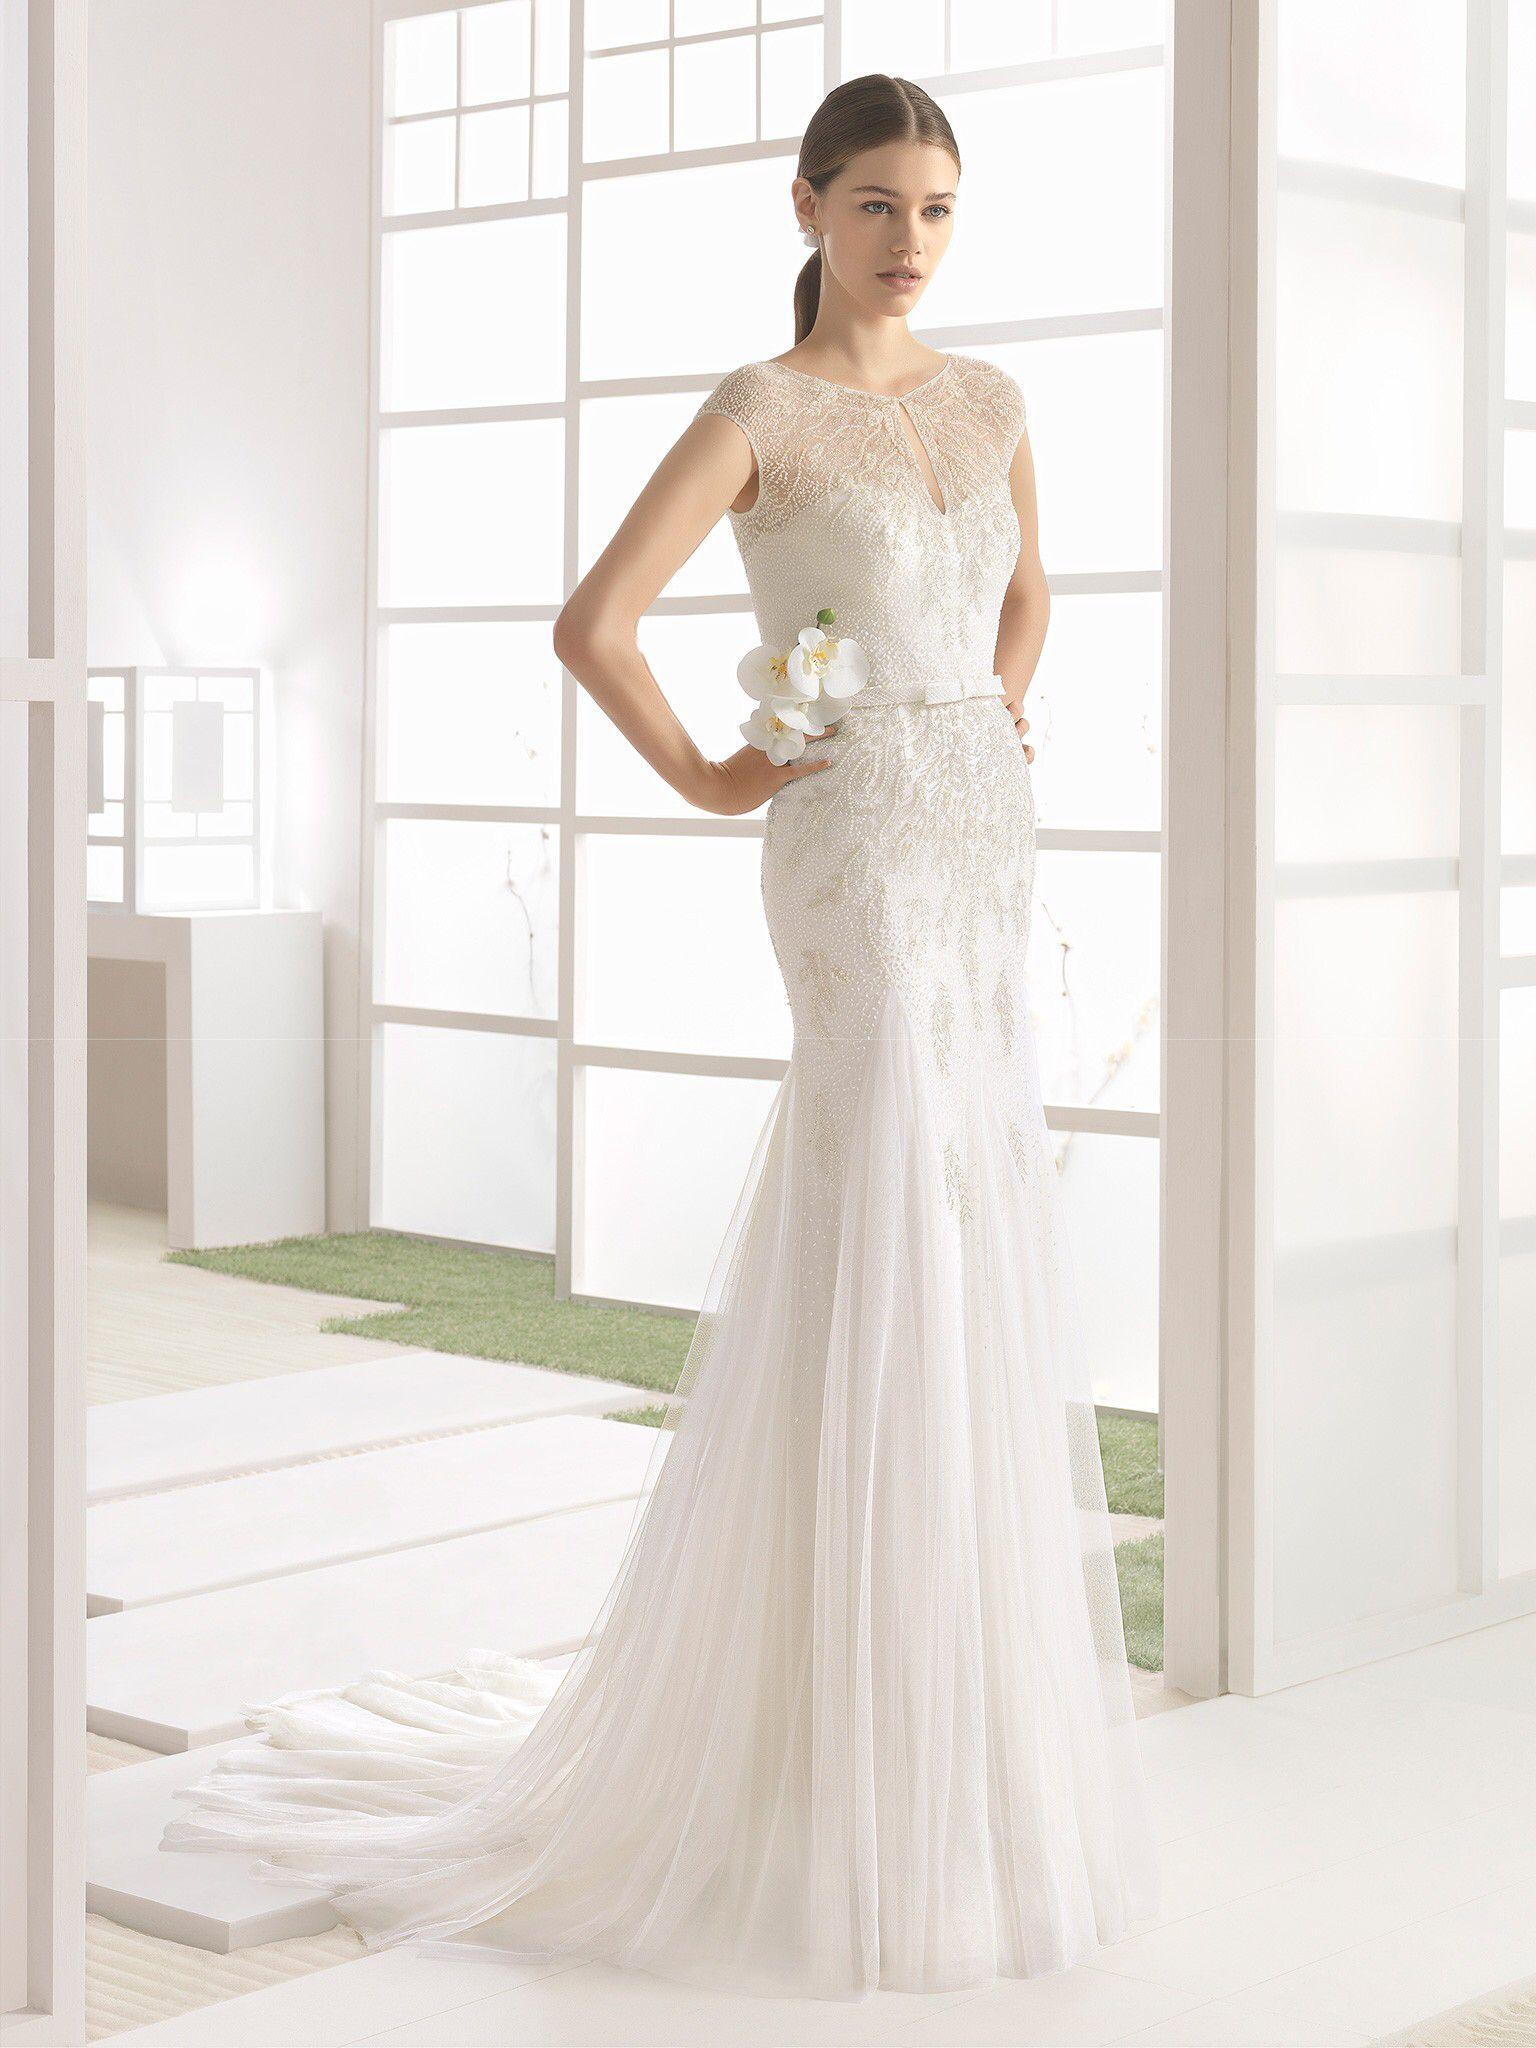 Famous wedding dresses  Pin by Maria Del Pilar Camargo Sanabria on Wedding dresses